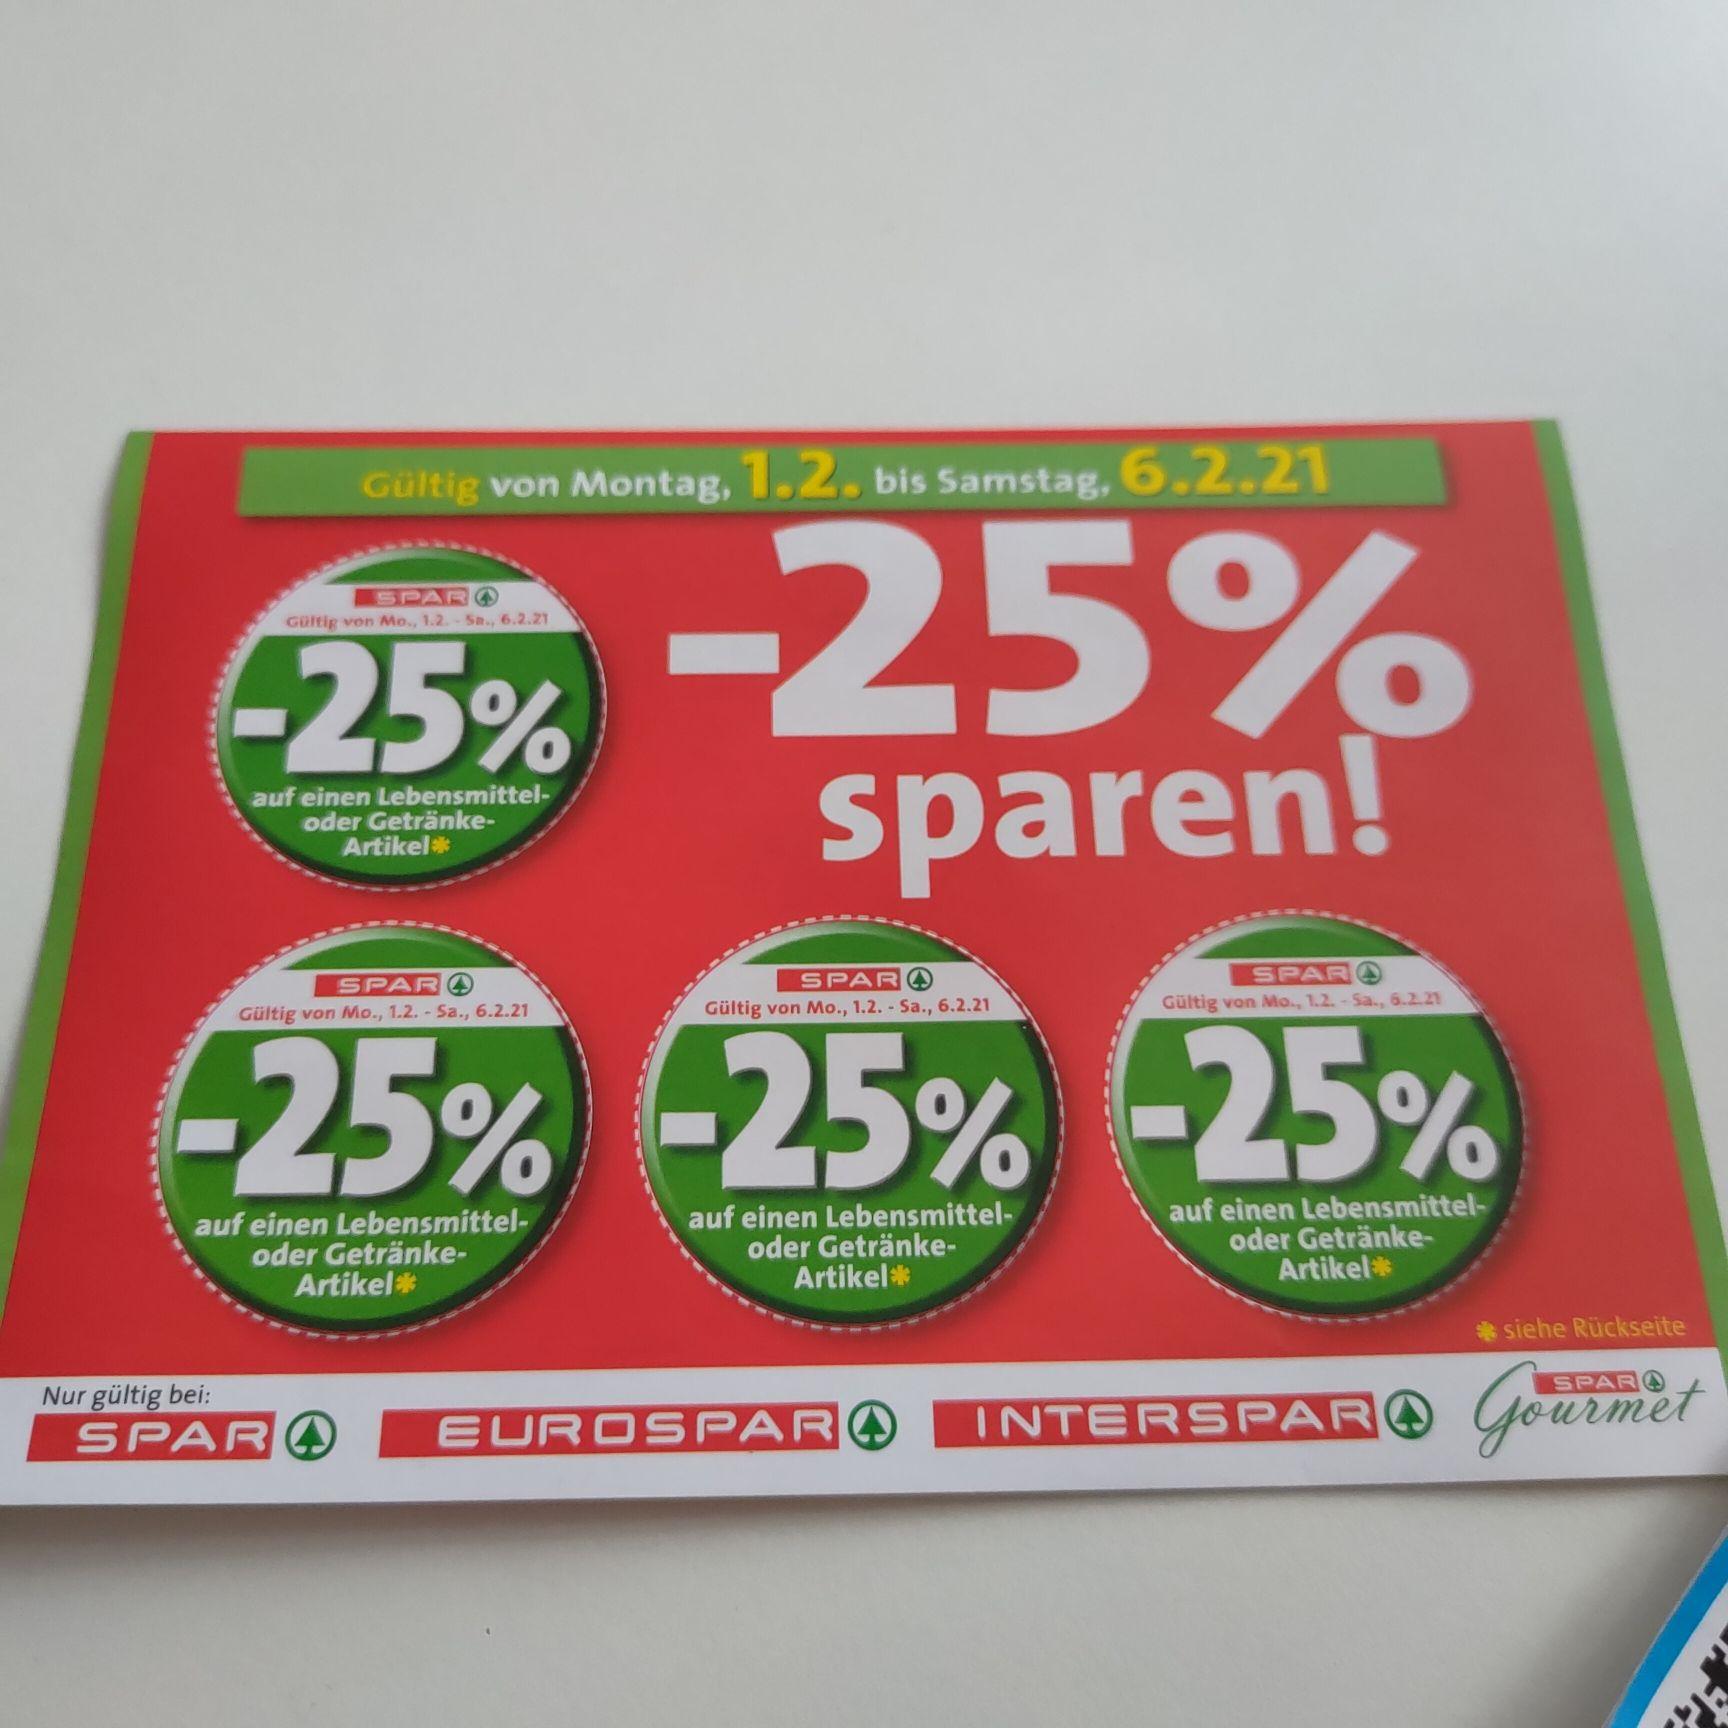 [Spar, Eurospar, Interspar] 25% Rabattsticker